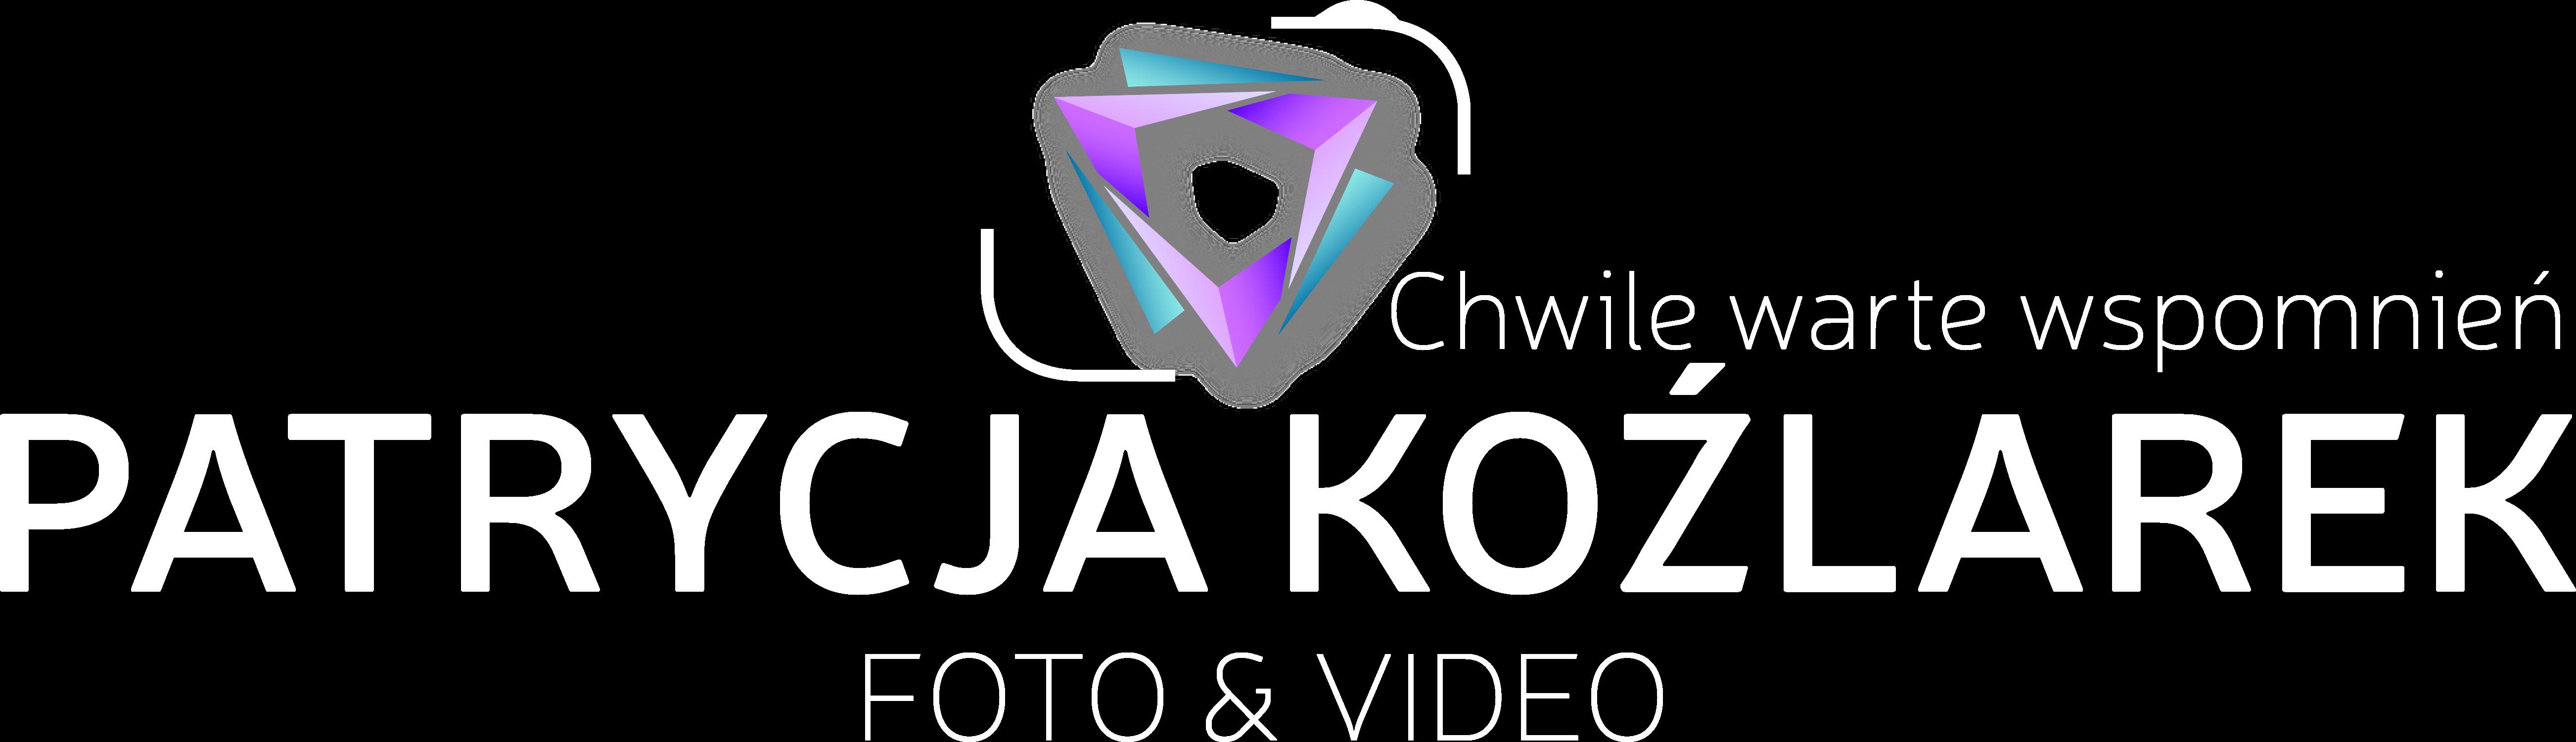 Patrycja Koźlarek – Fotograf Koszalin